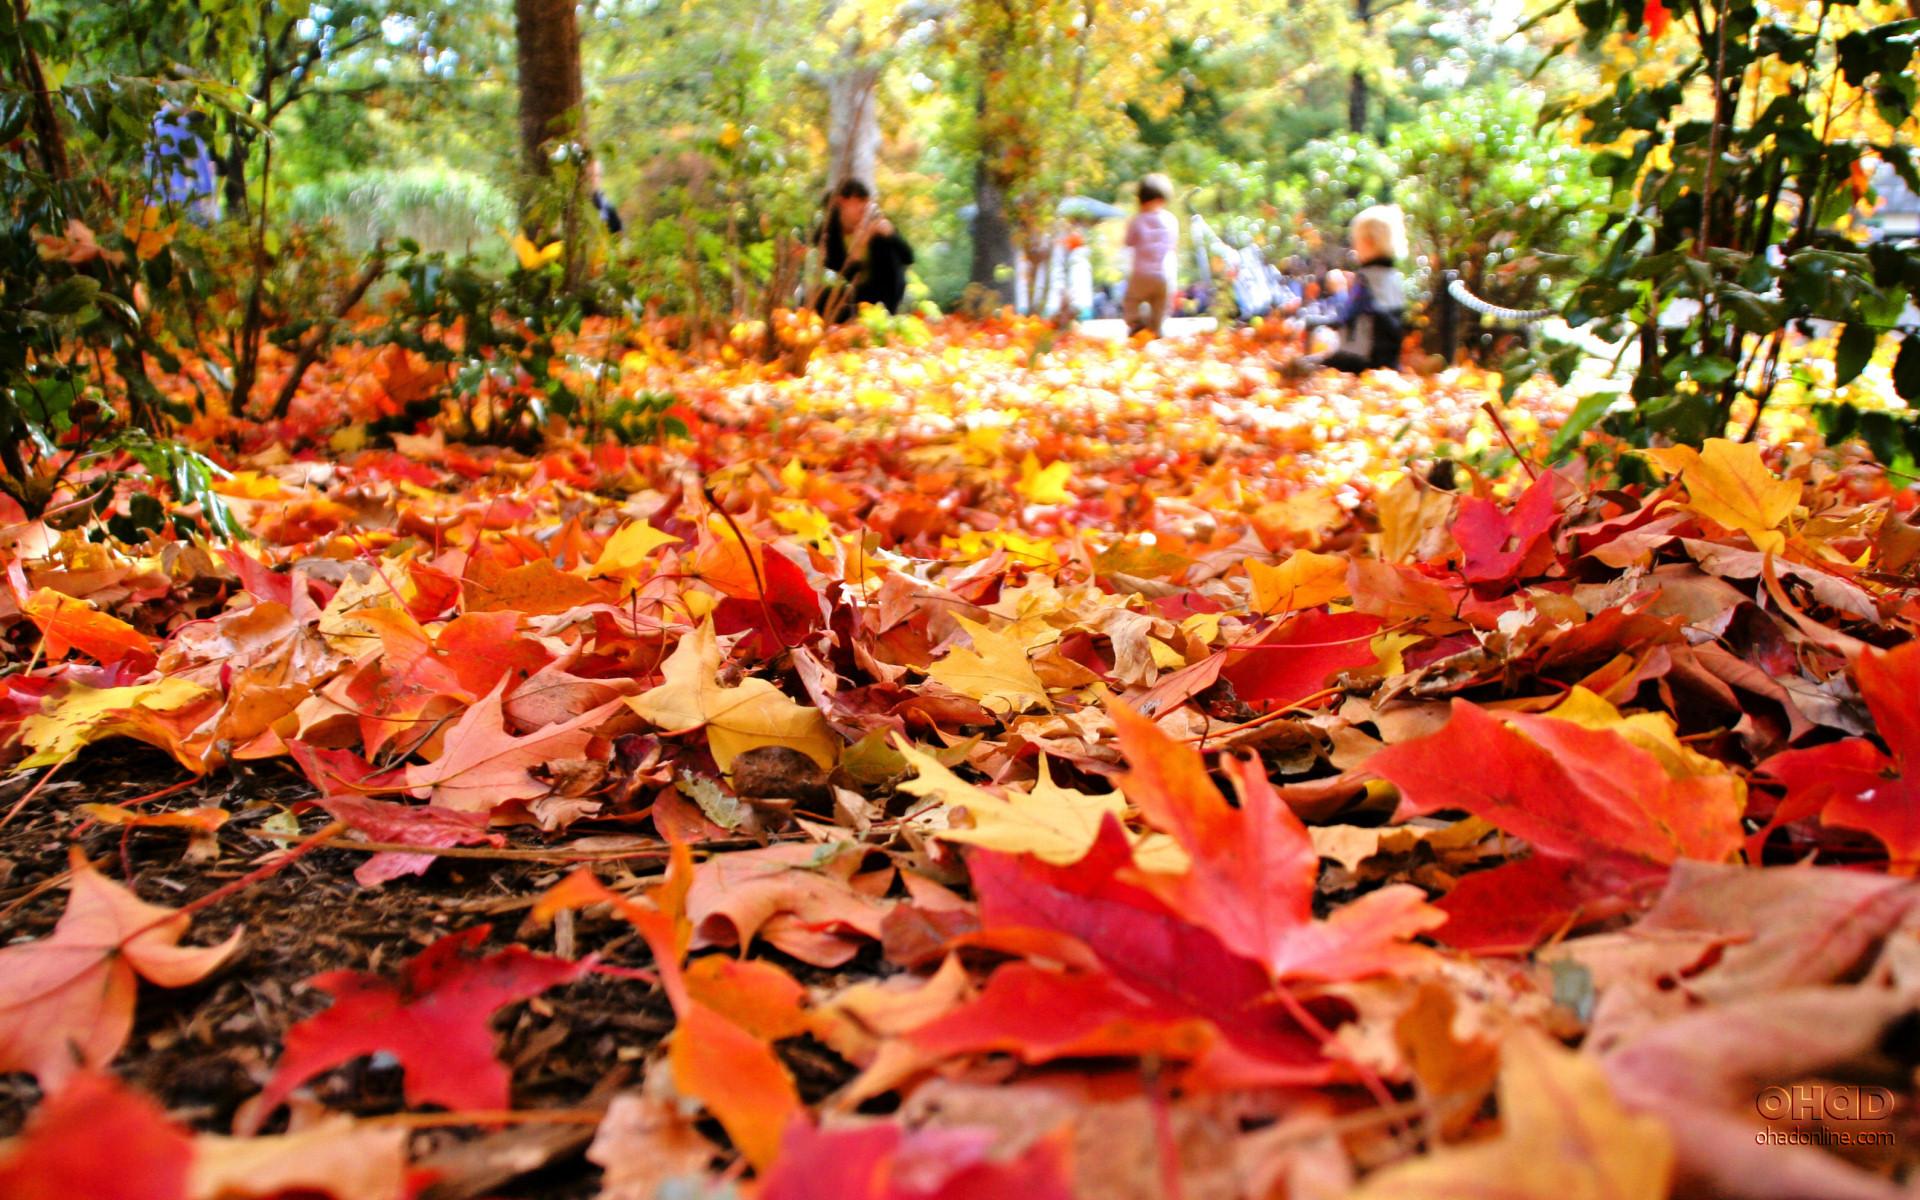 Autumn Leaves Falling Clip Art. fall wallpaper hd autumn road scenic …